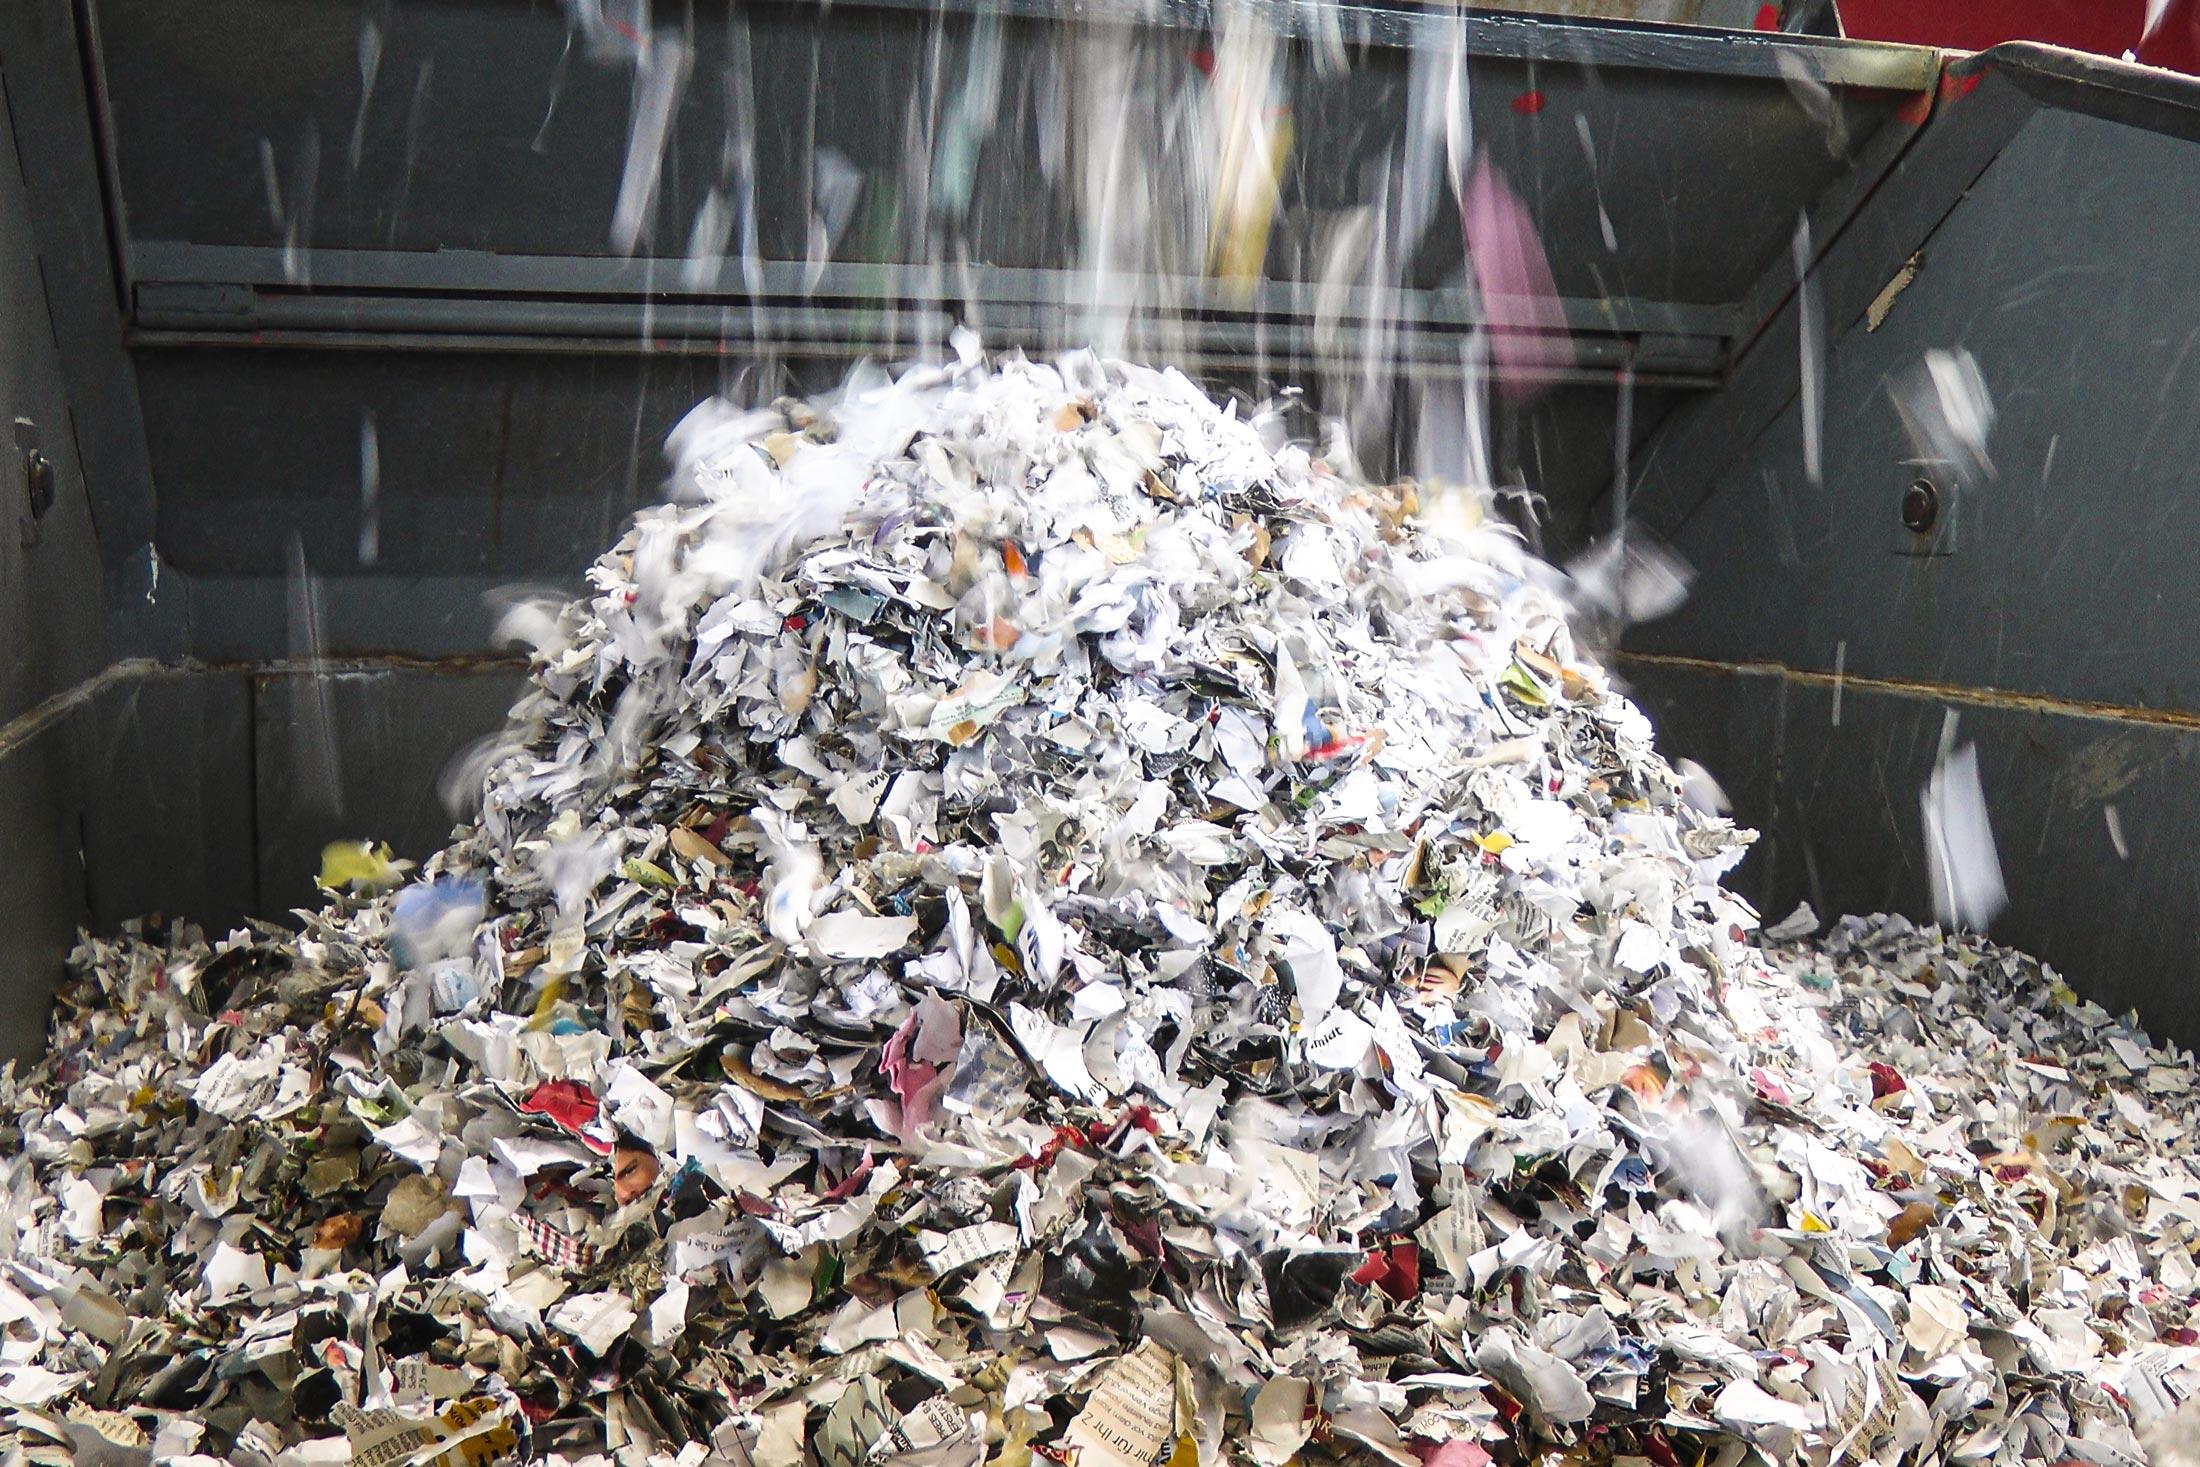 Piles of shredded paper scraps